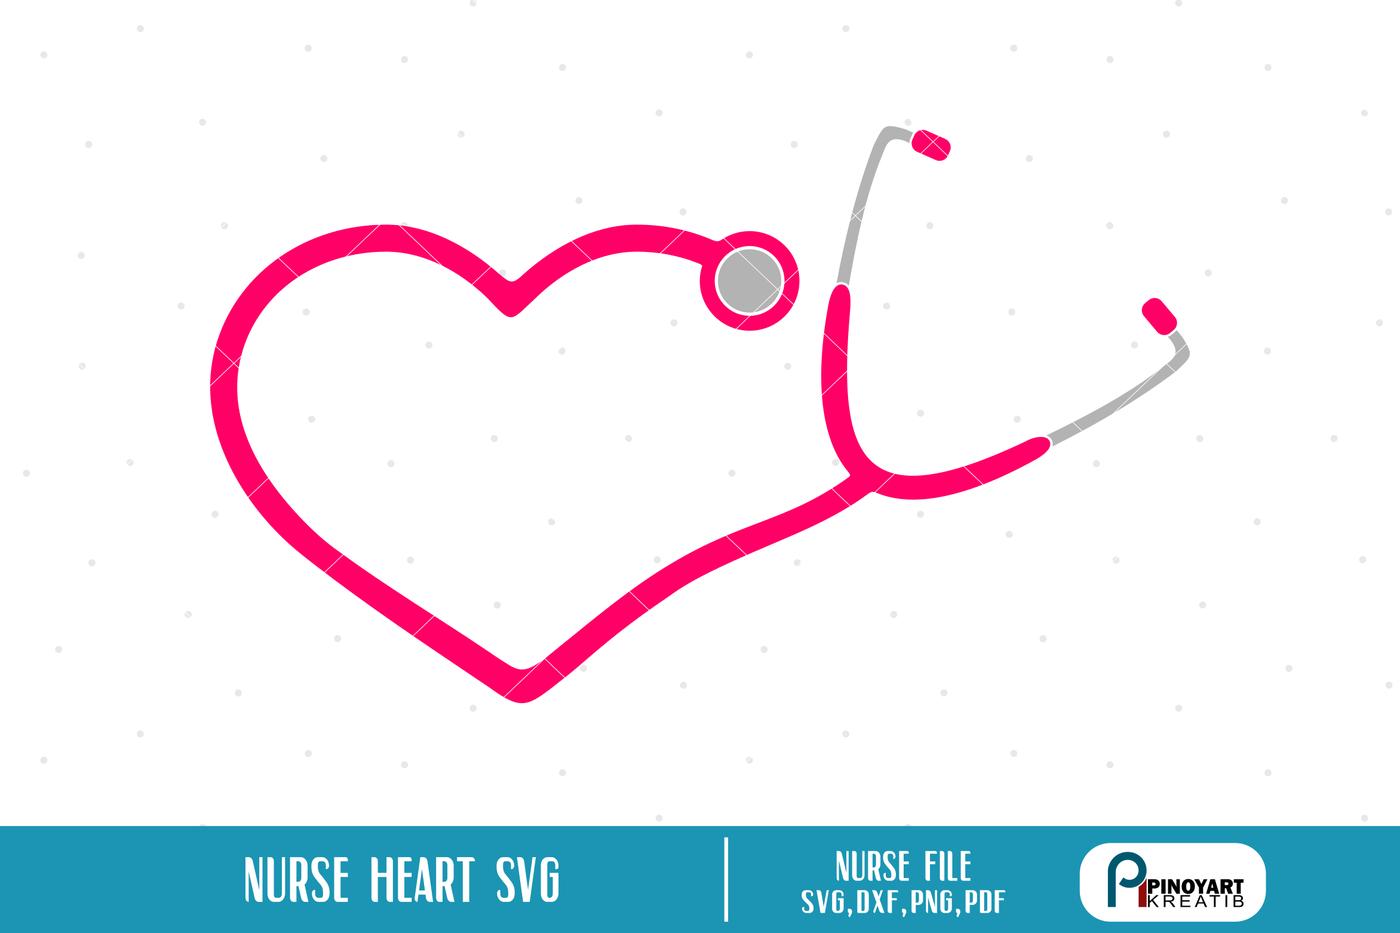 Nurse Stethoscope Svg Nurse Svg Nurse Dxf Nurse Clip Art Hospital